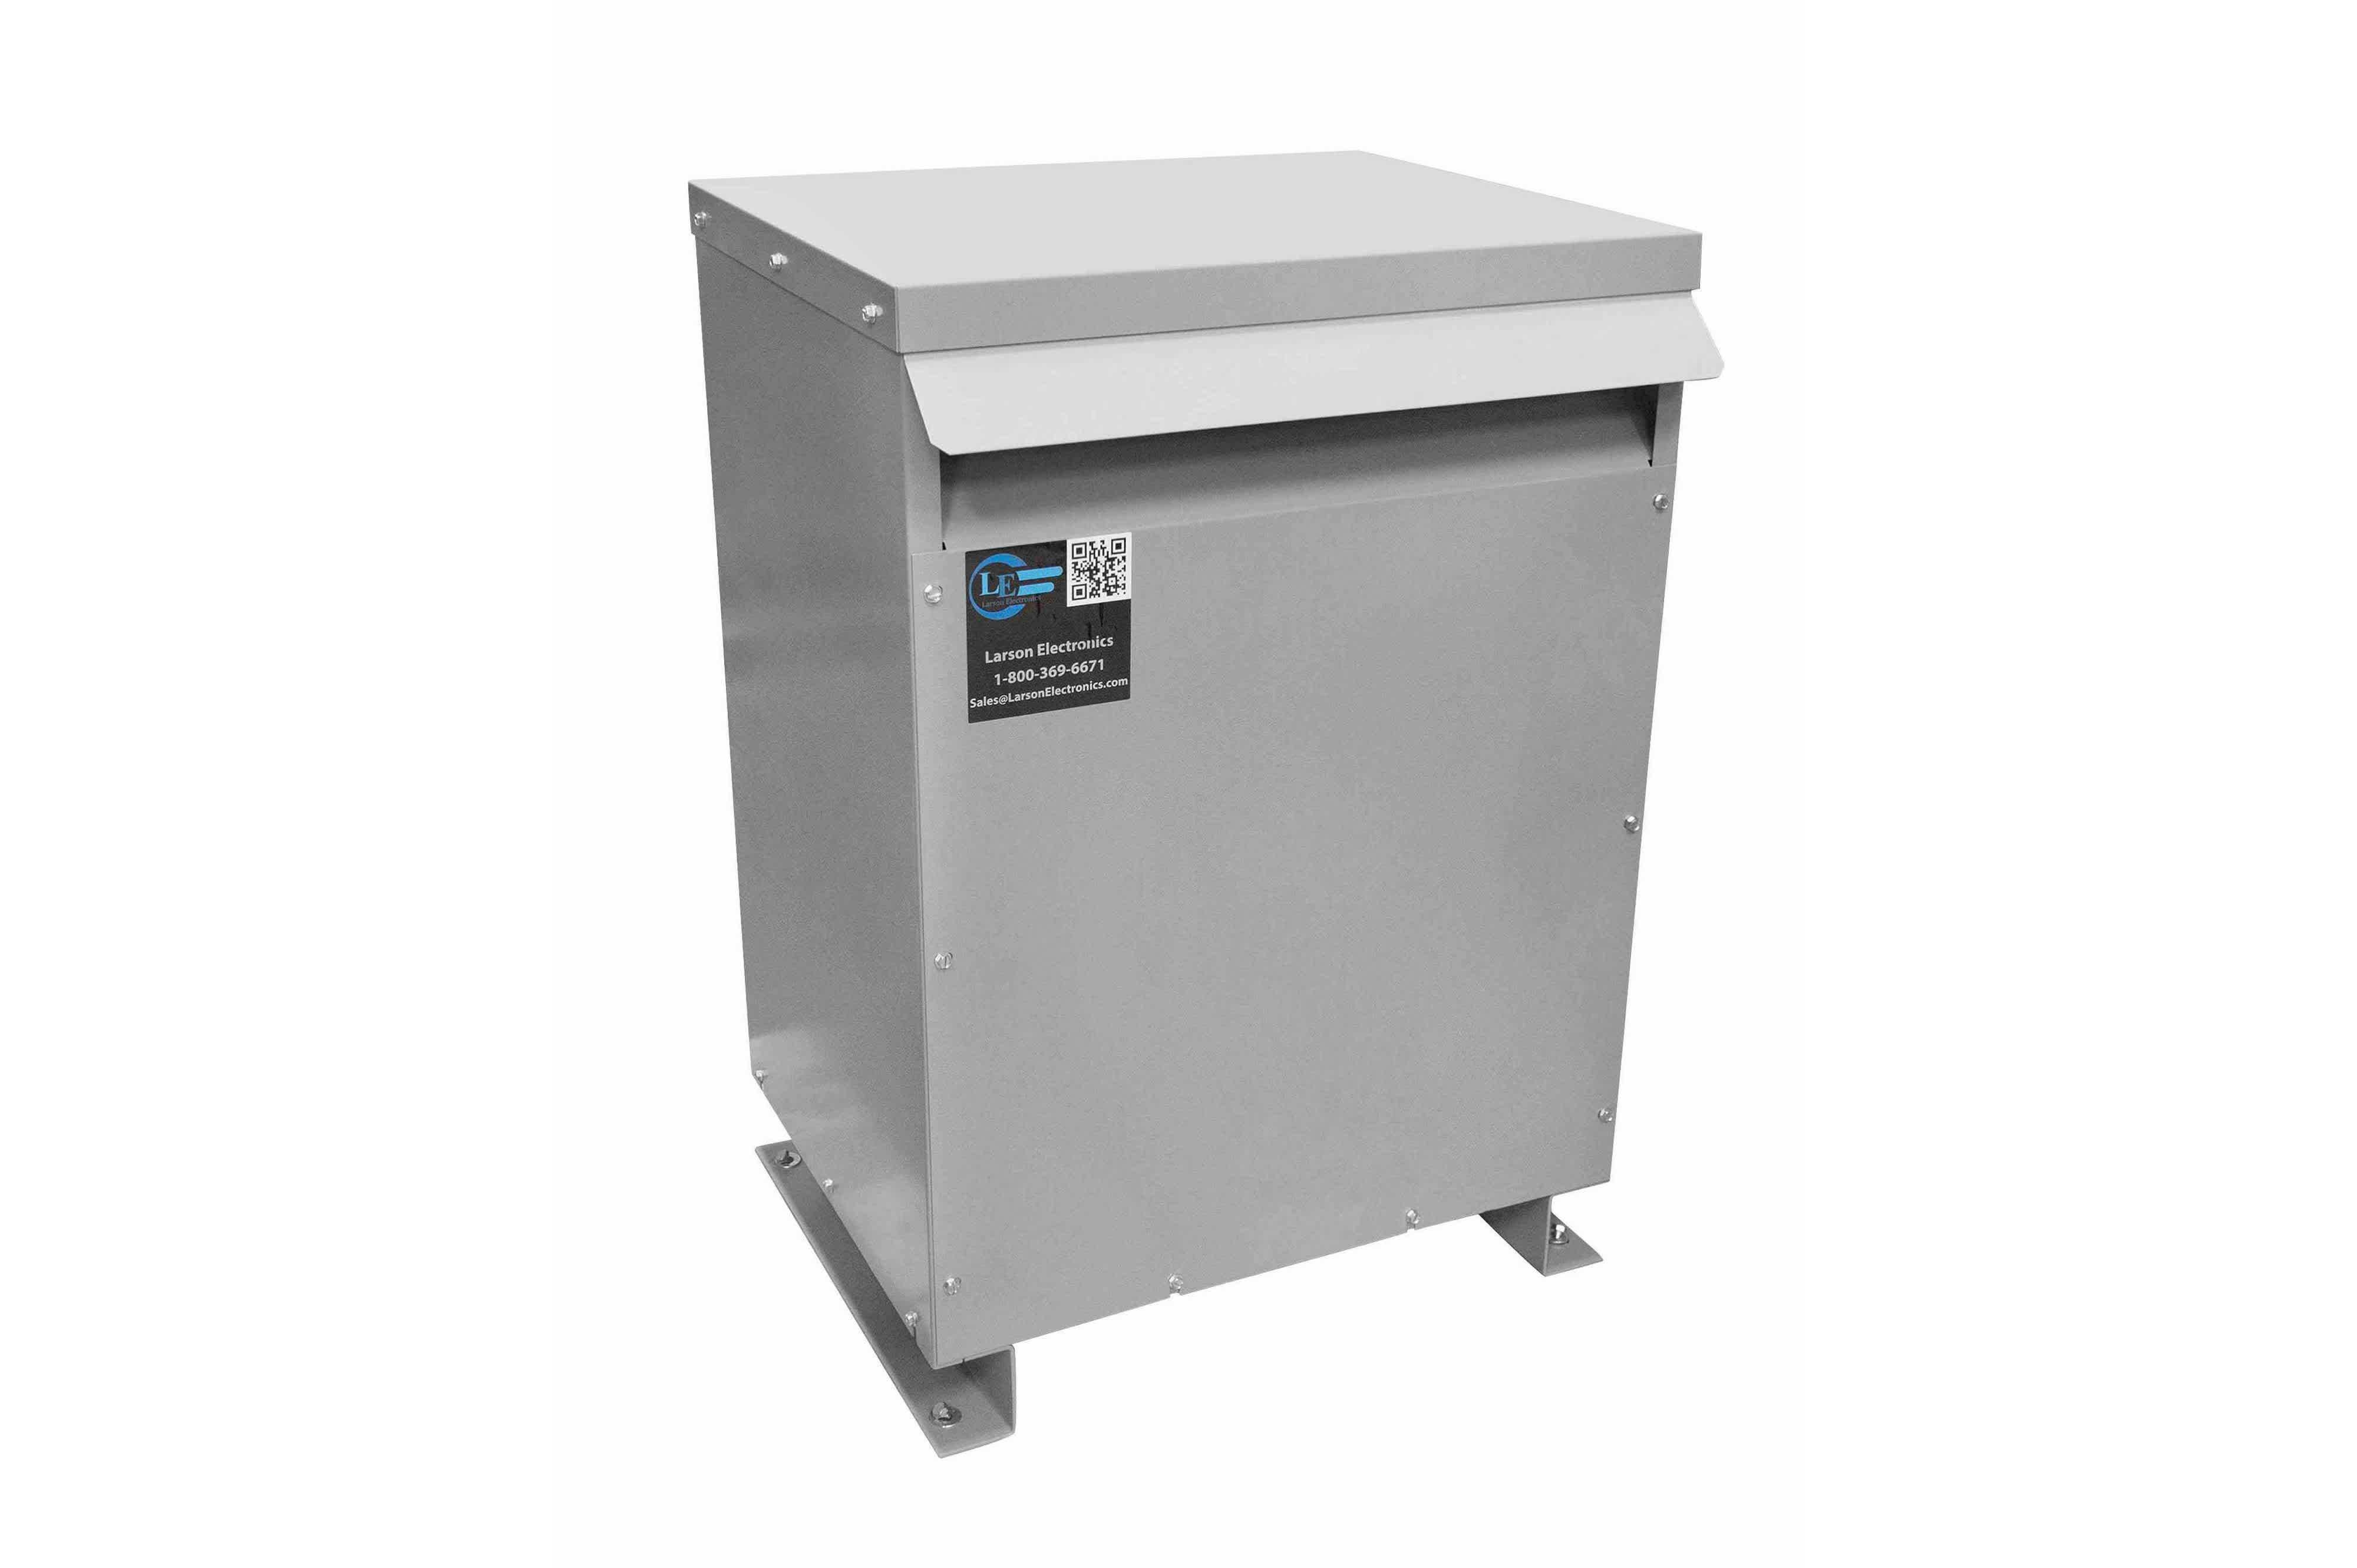 900 kVA 3PH Isolation Transformer, 240V Wye Primary, 380V Delta Secondary, N3R, Ventilated, 60 Hz